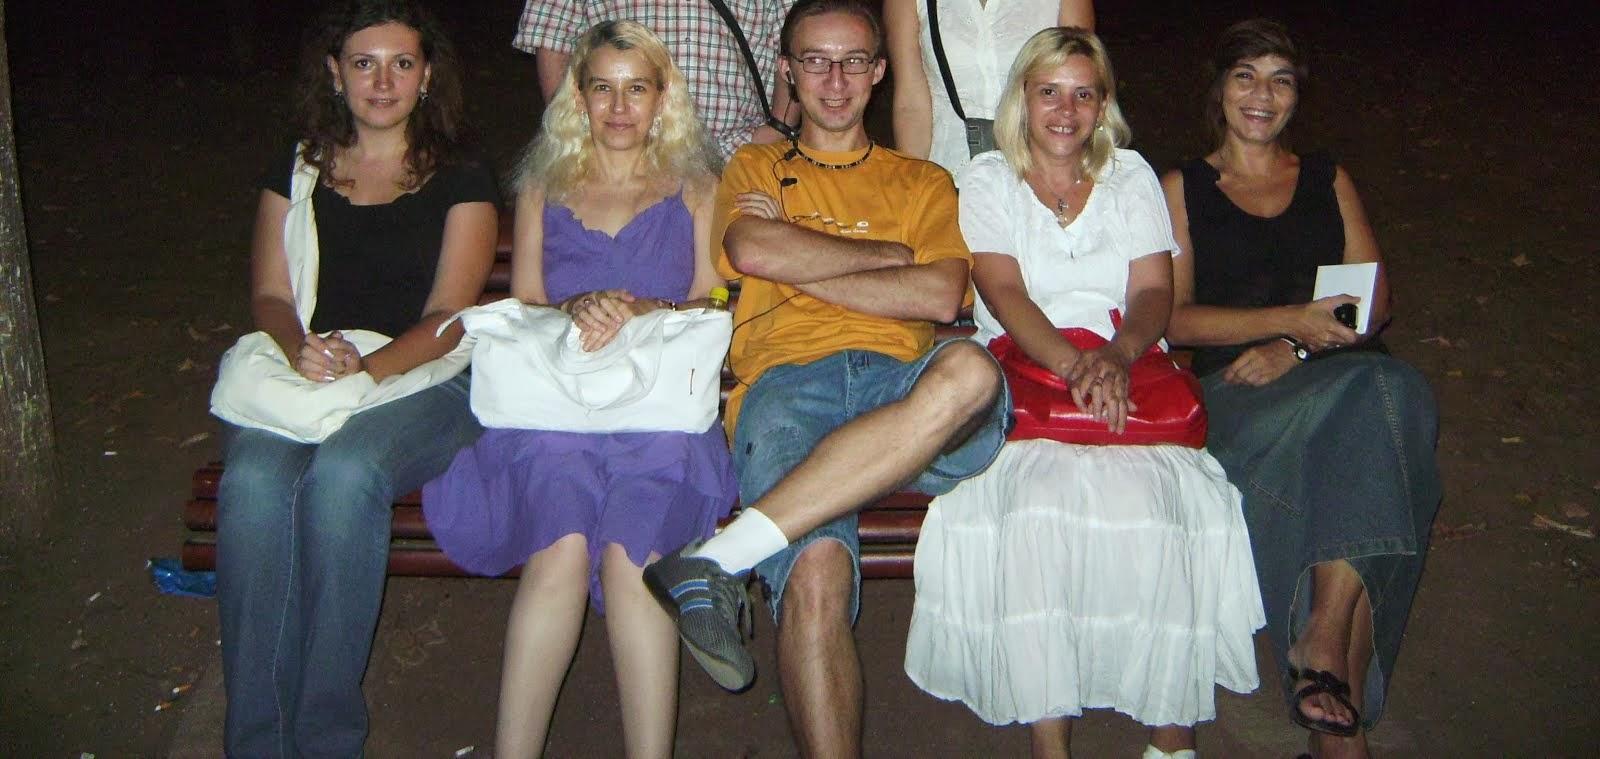 Olivia Maria Marcov, Alexandra Georgescu, Adrian Pafa, Bianca Eftimie,colegii mei, 2009, Bucharest